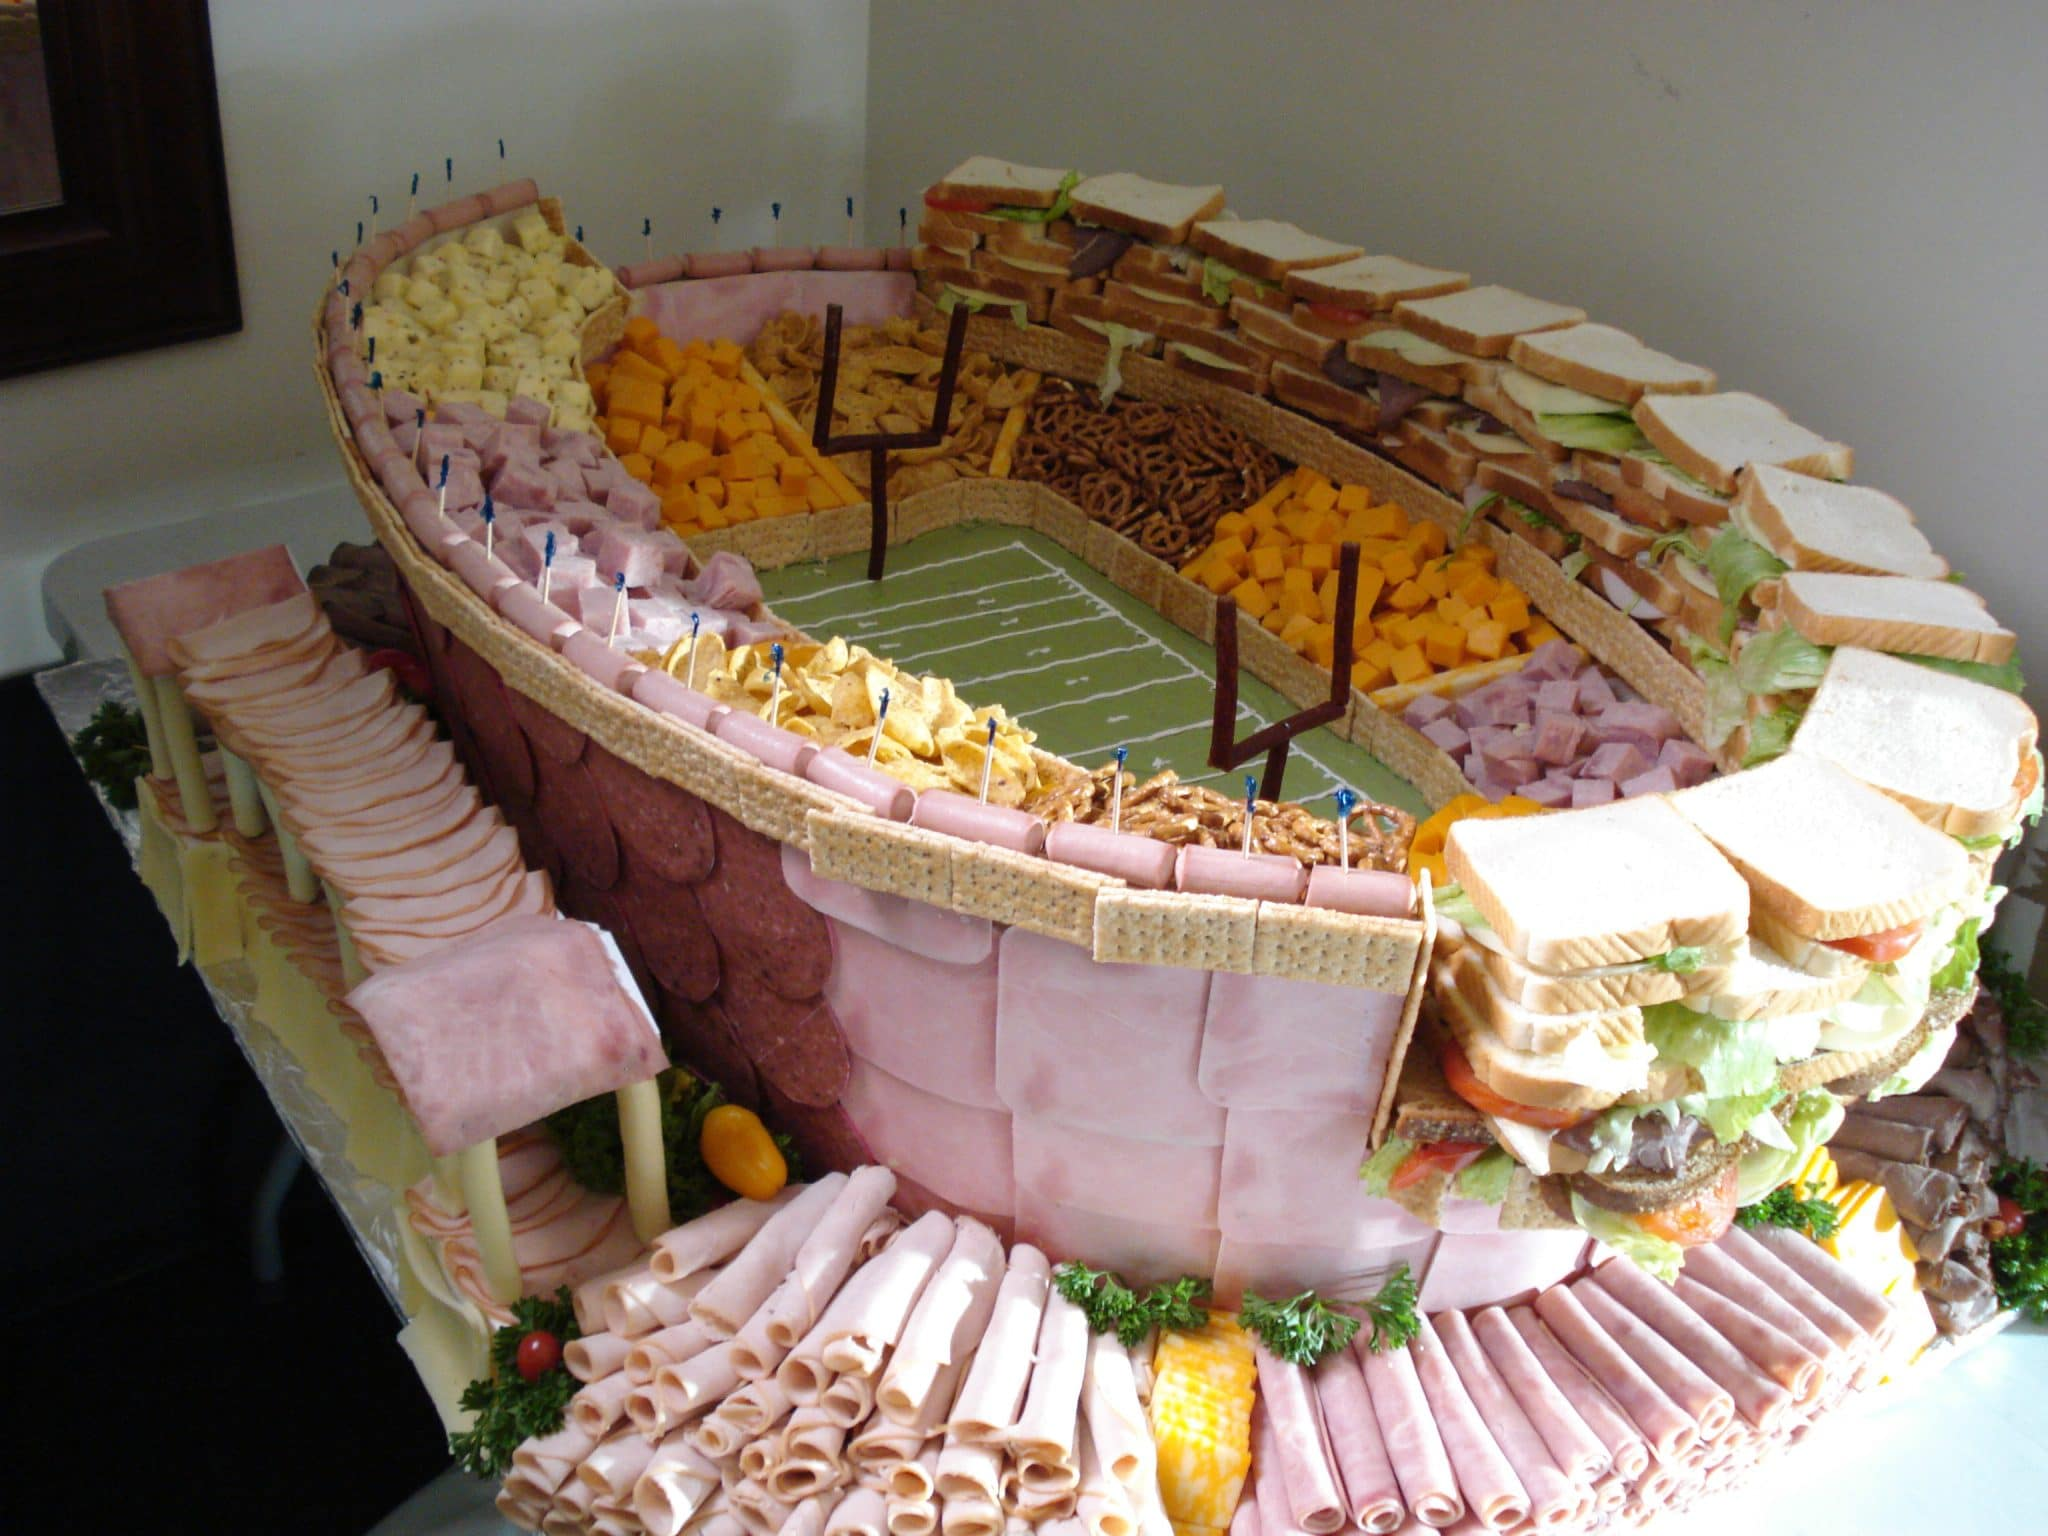 The Ultimate Super Bowl Party Platter Idea Sandwich Stadium